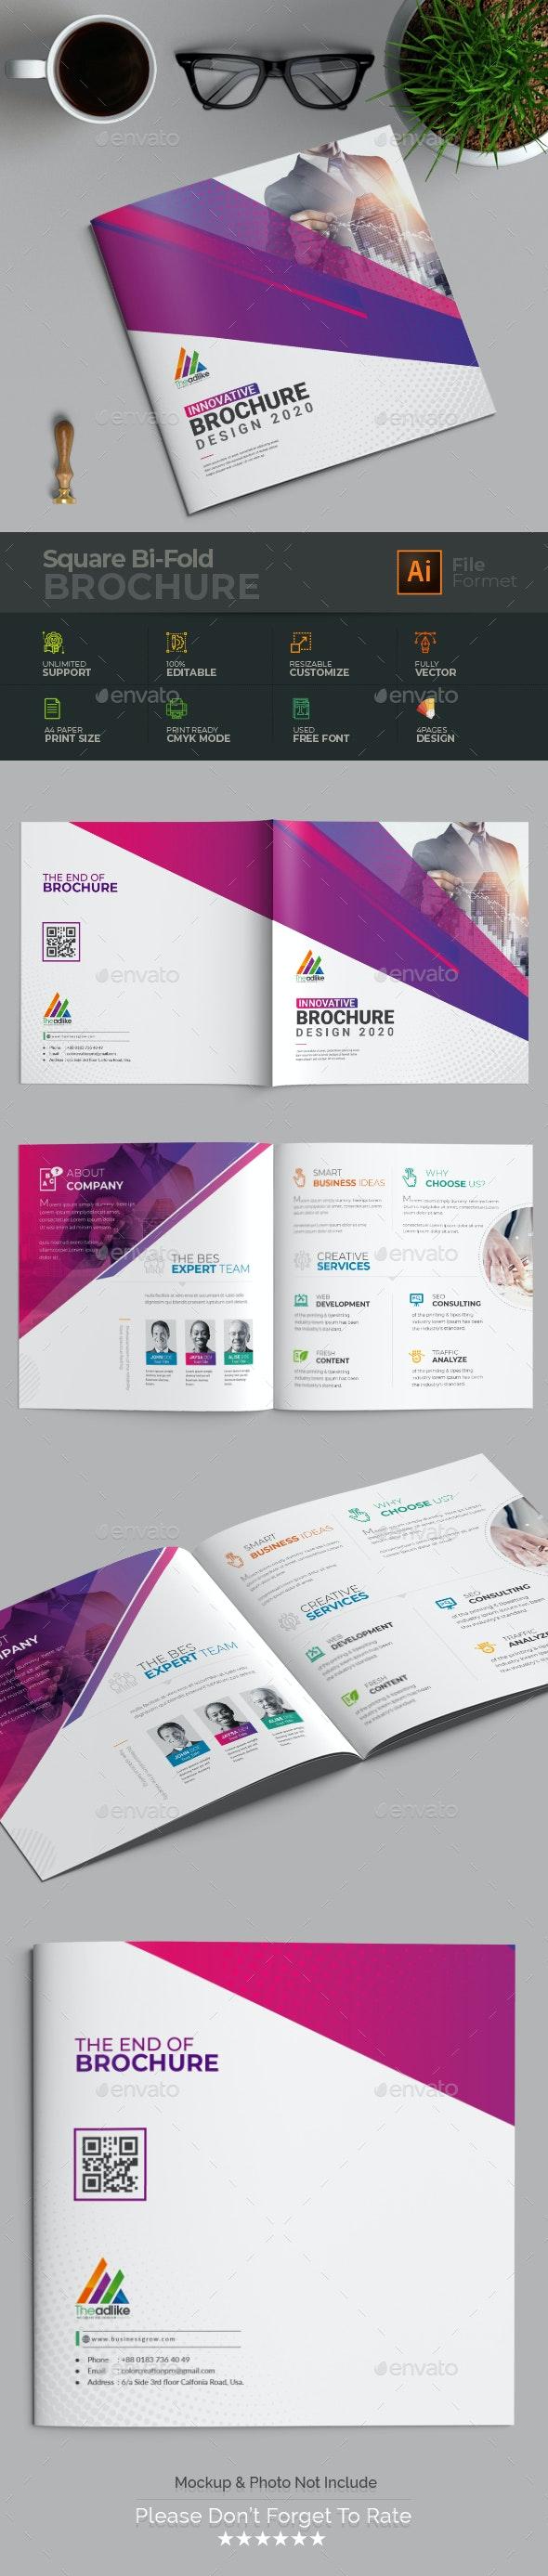 Square Bi Fold Brochure - Brochures Print Templates